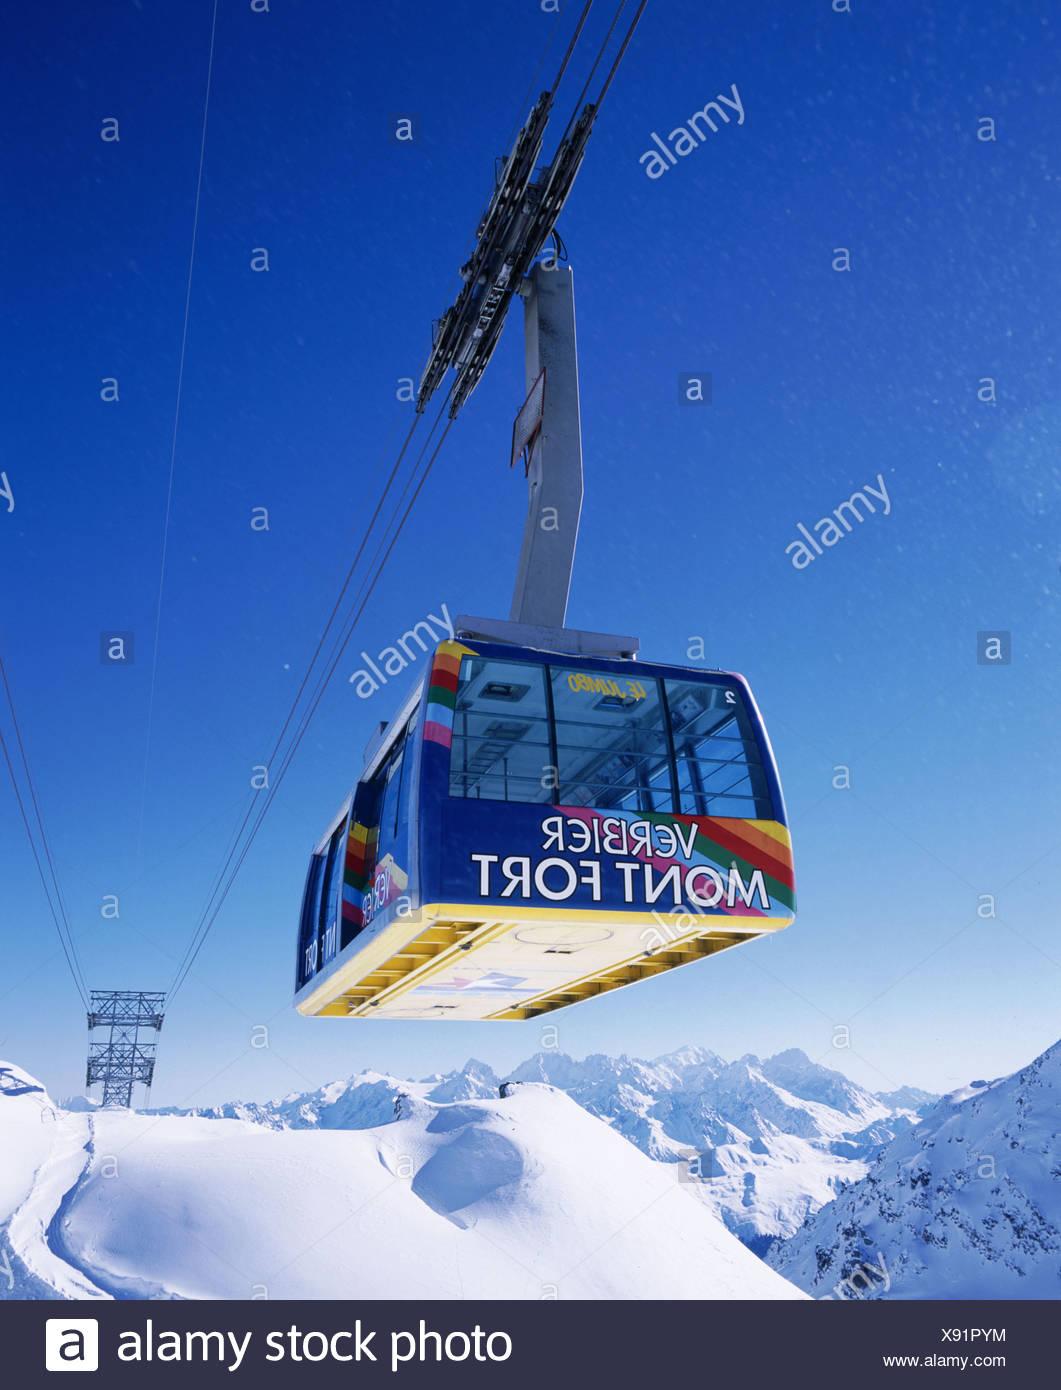 mountains gondola Mont fort mountains Switzerland Europe ski skiing area Verbier Valais Switzerland Europ - Stock Image